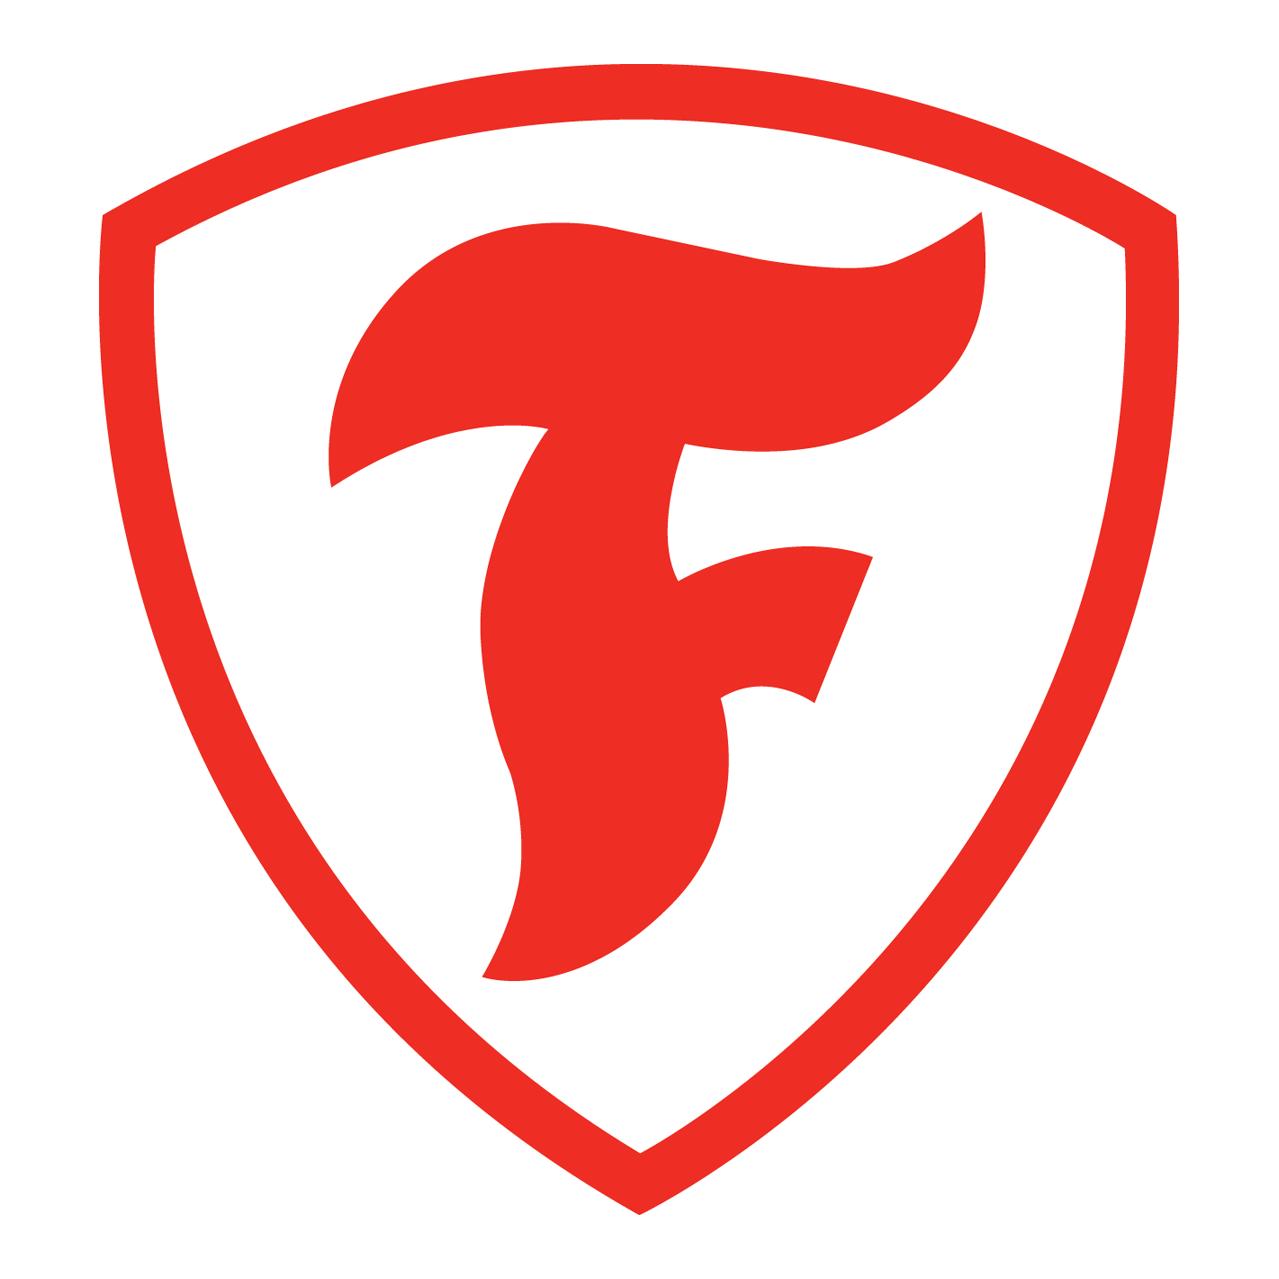 Pin by bernard on ok | Firestone logo, Logos, Logo branding | 1279 x 1279 png 89kB